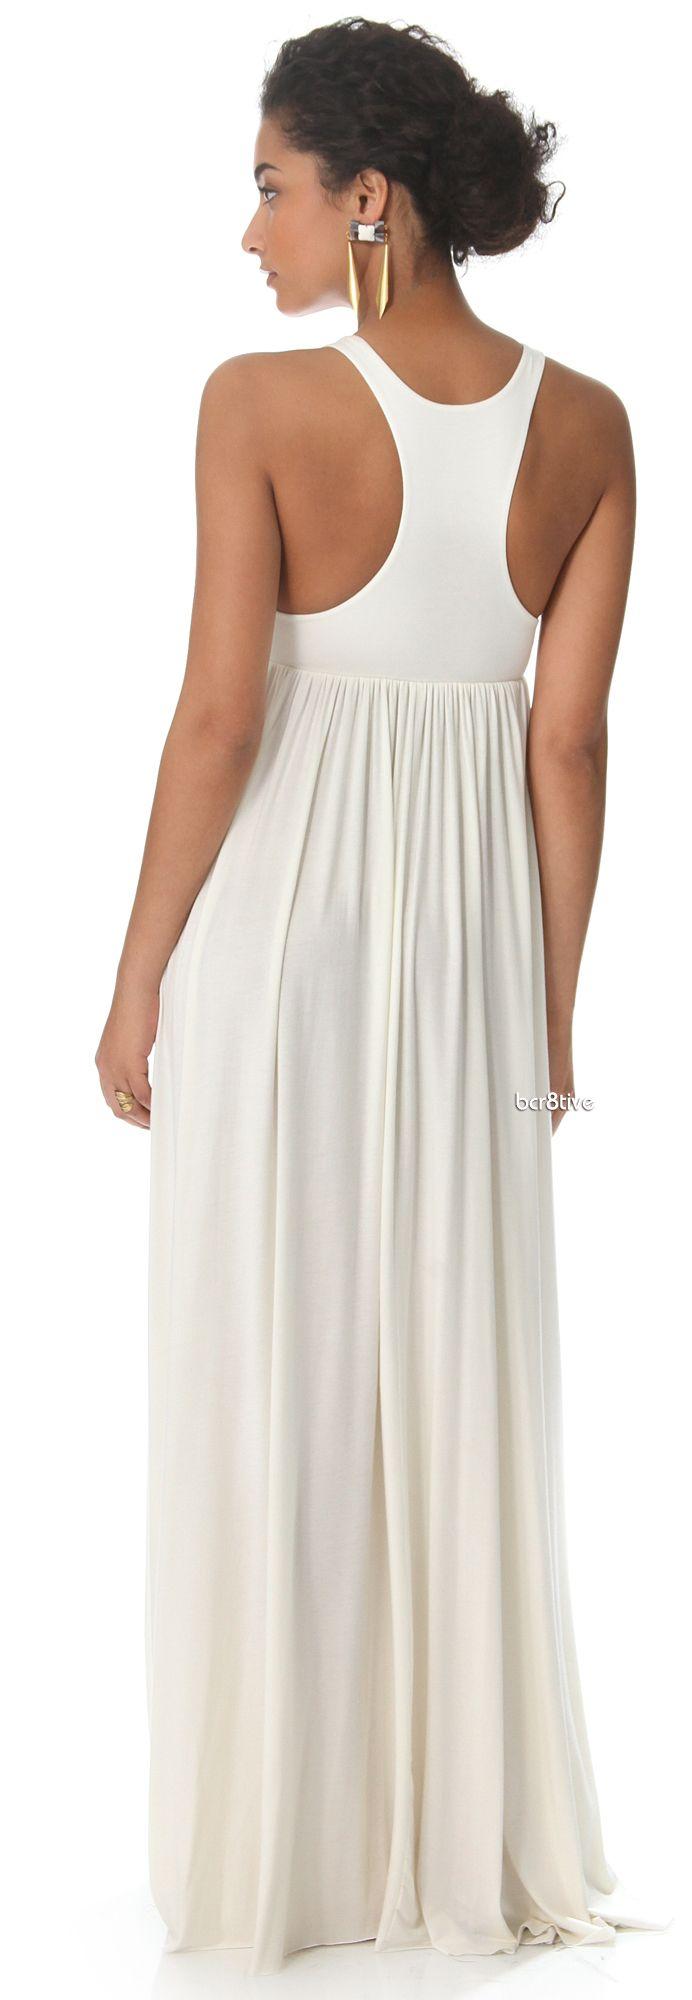 Rachel Pally Anya Maxi Dress -  Shopbop